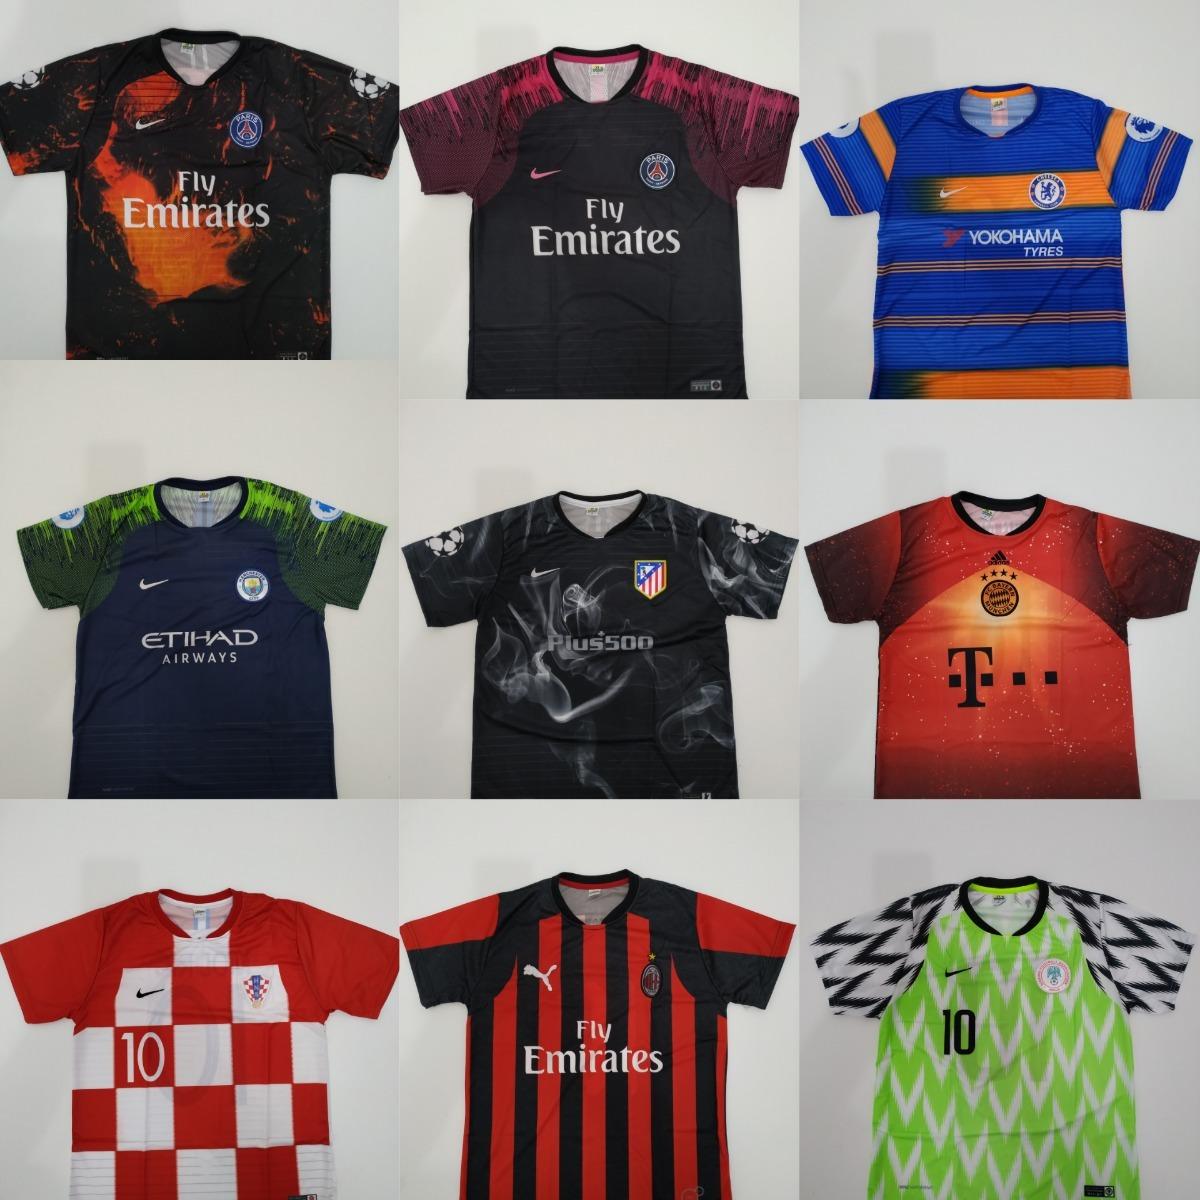 Kit 10 Camisetas Time De Futebol - Nacionais   Europeus - R  189 88451d8922341